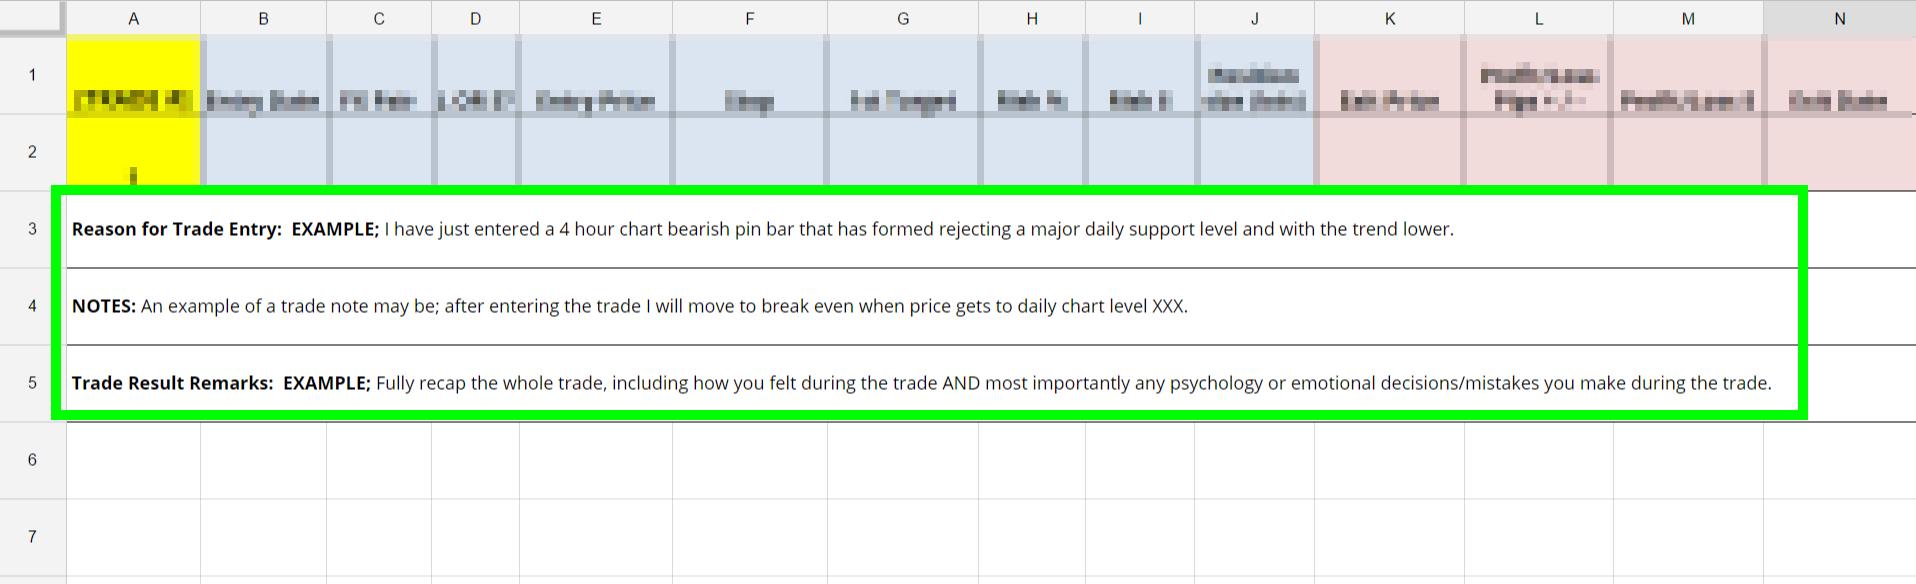 Forex Trading Journal Spreadsheet In Forex Trading Journal Spreadsheet Excel